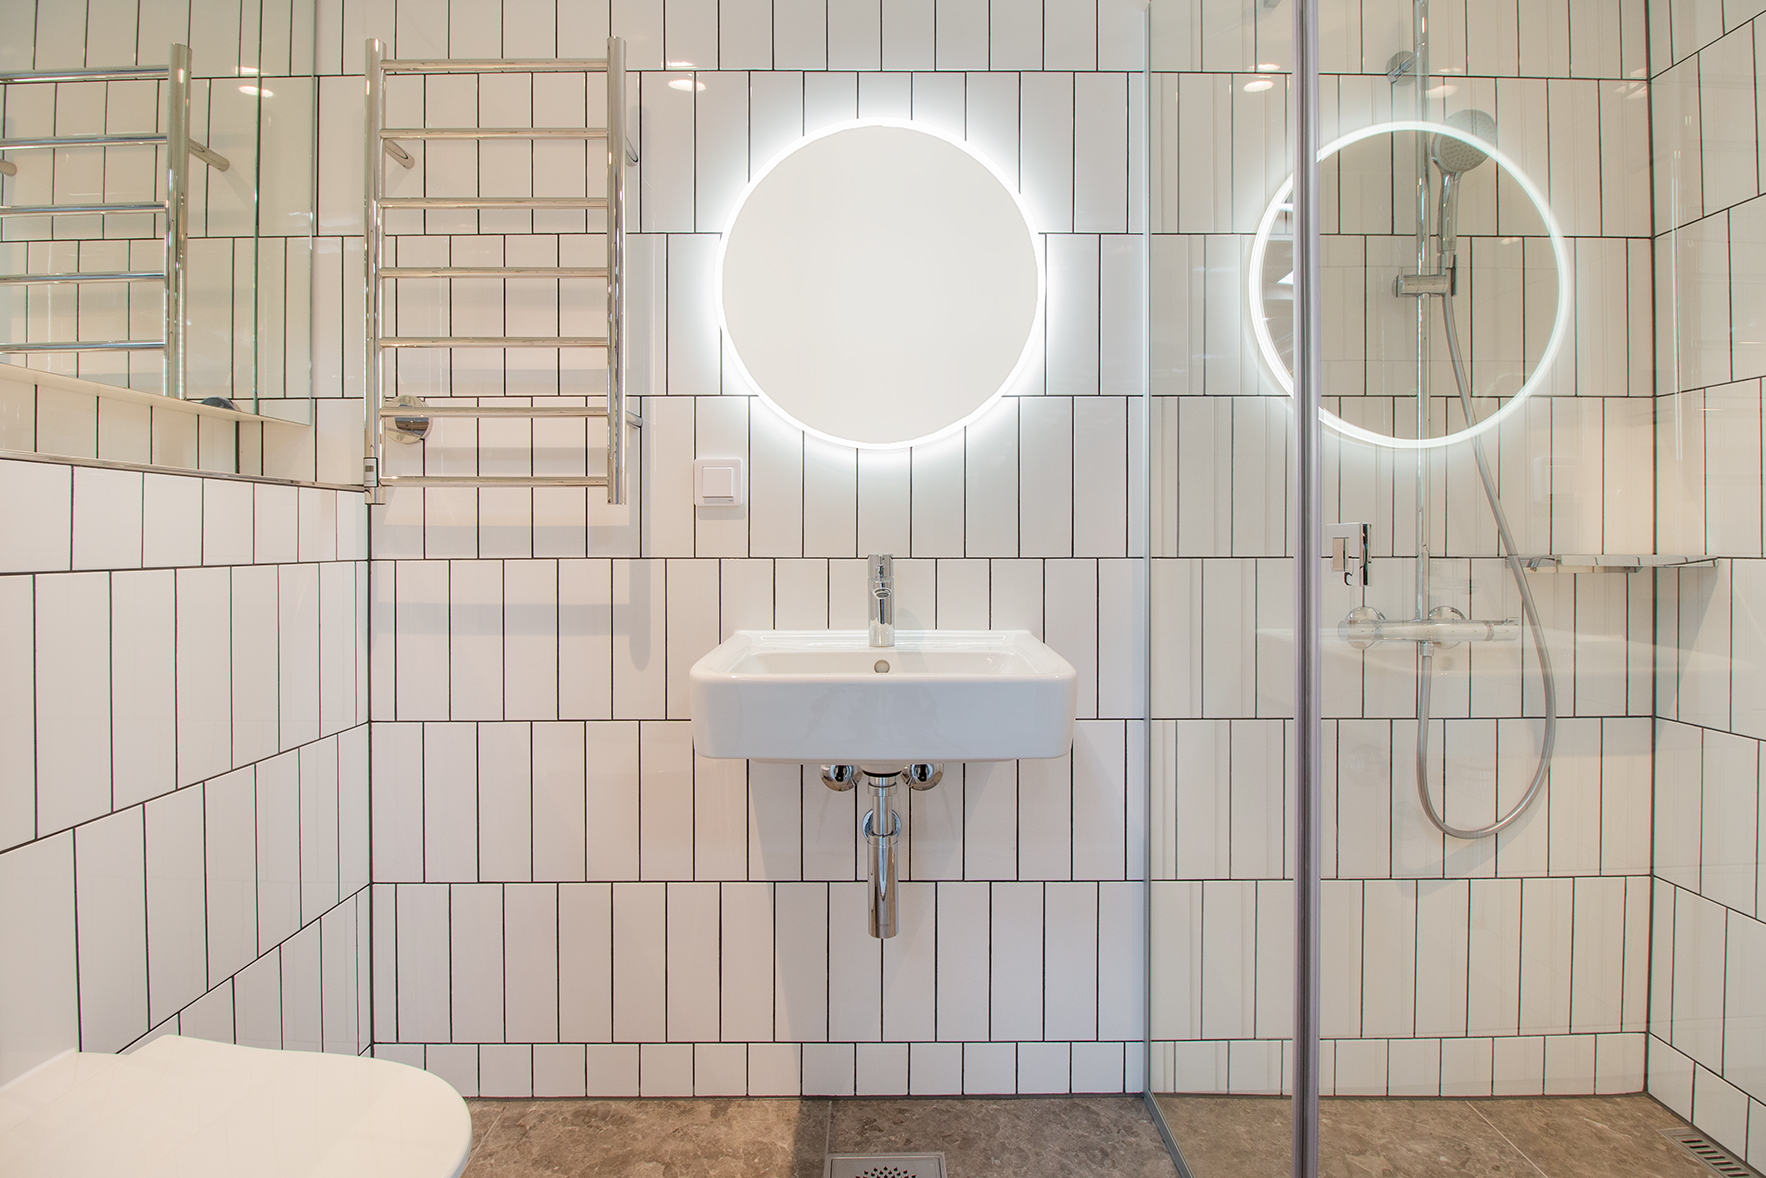 Modular bathroom pods for the Music Tower Hotel in Helsinki